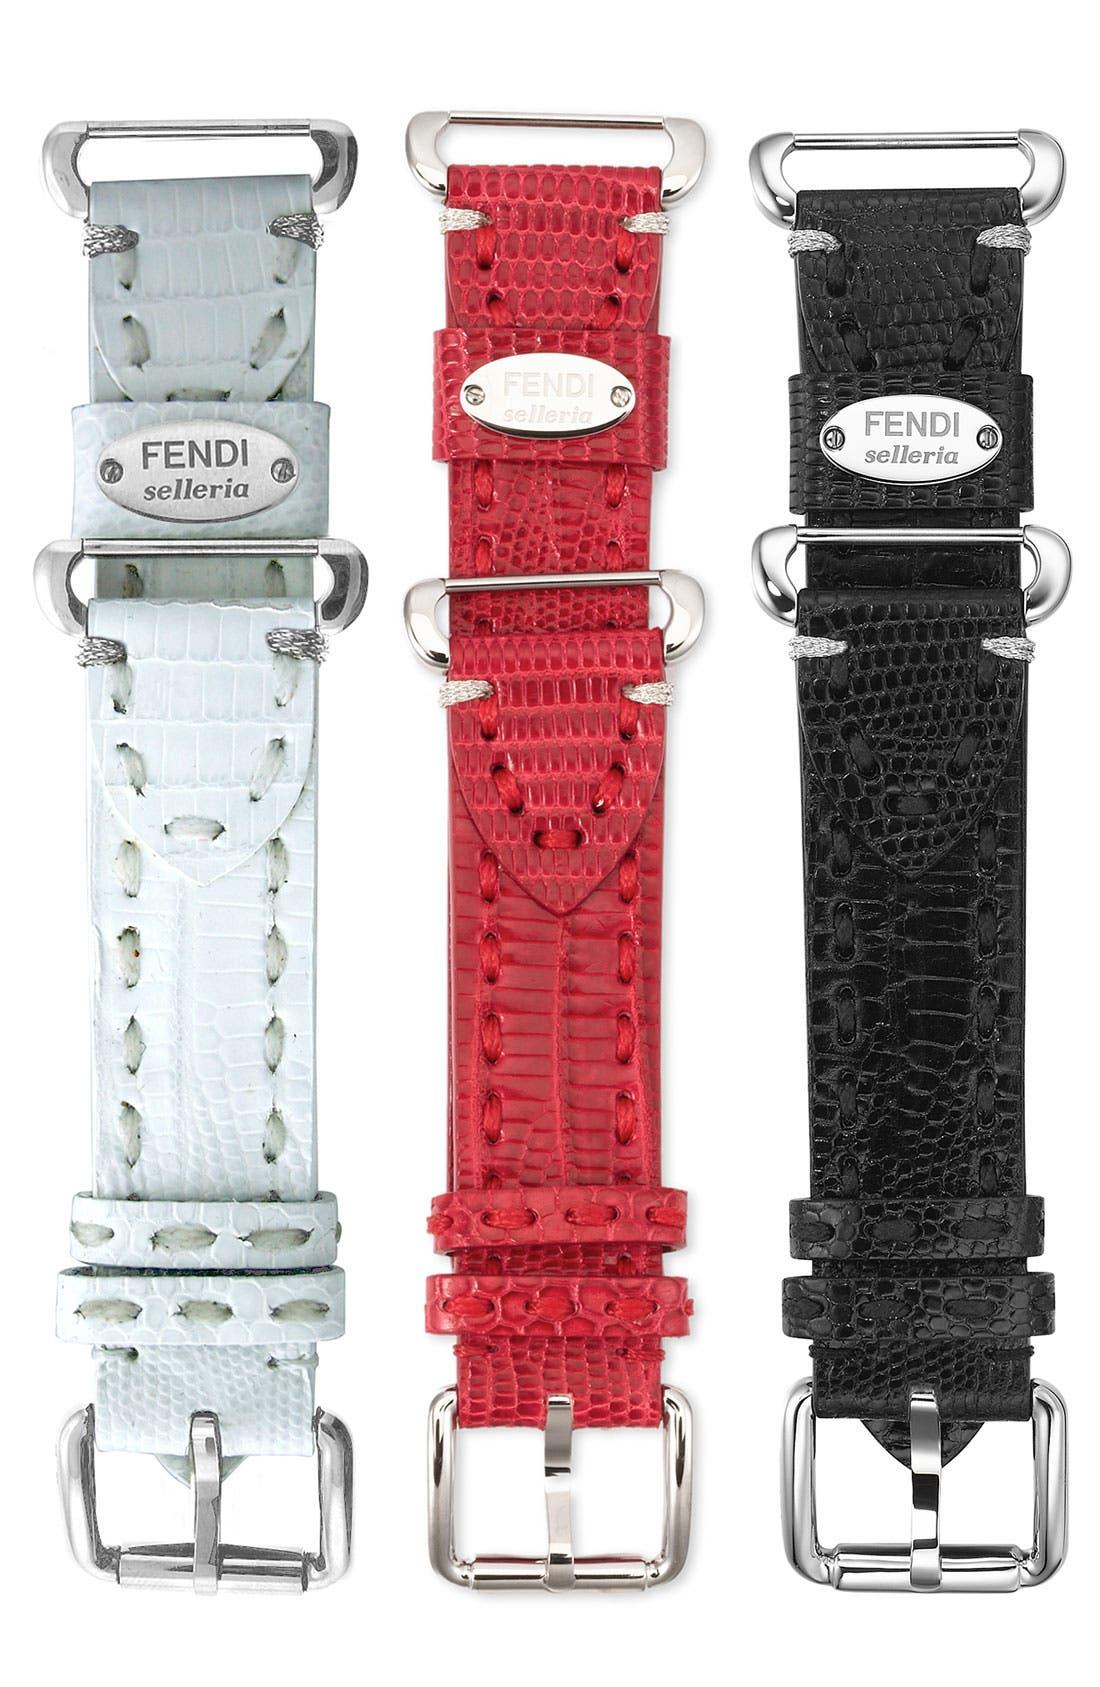 Alternate Image 2  - Fendi 'Selleria' 18mm Teju Lizardskin Watch Strap